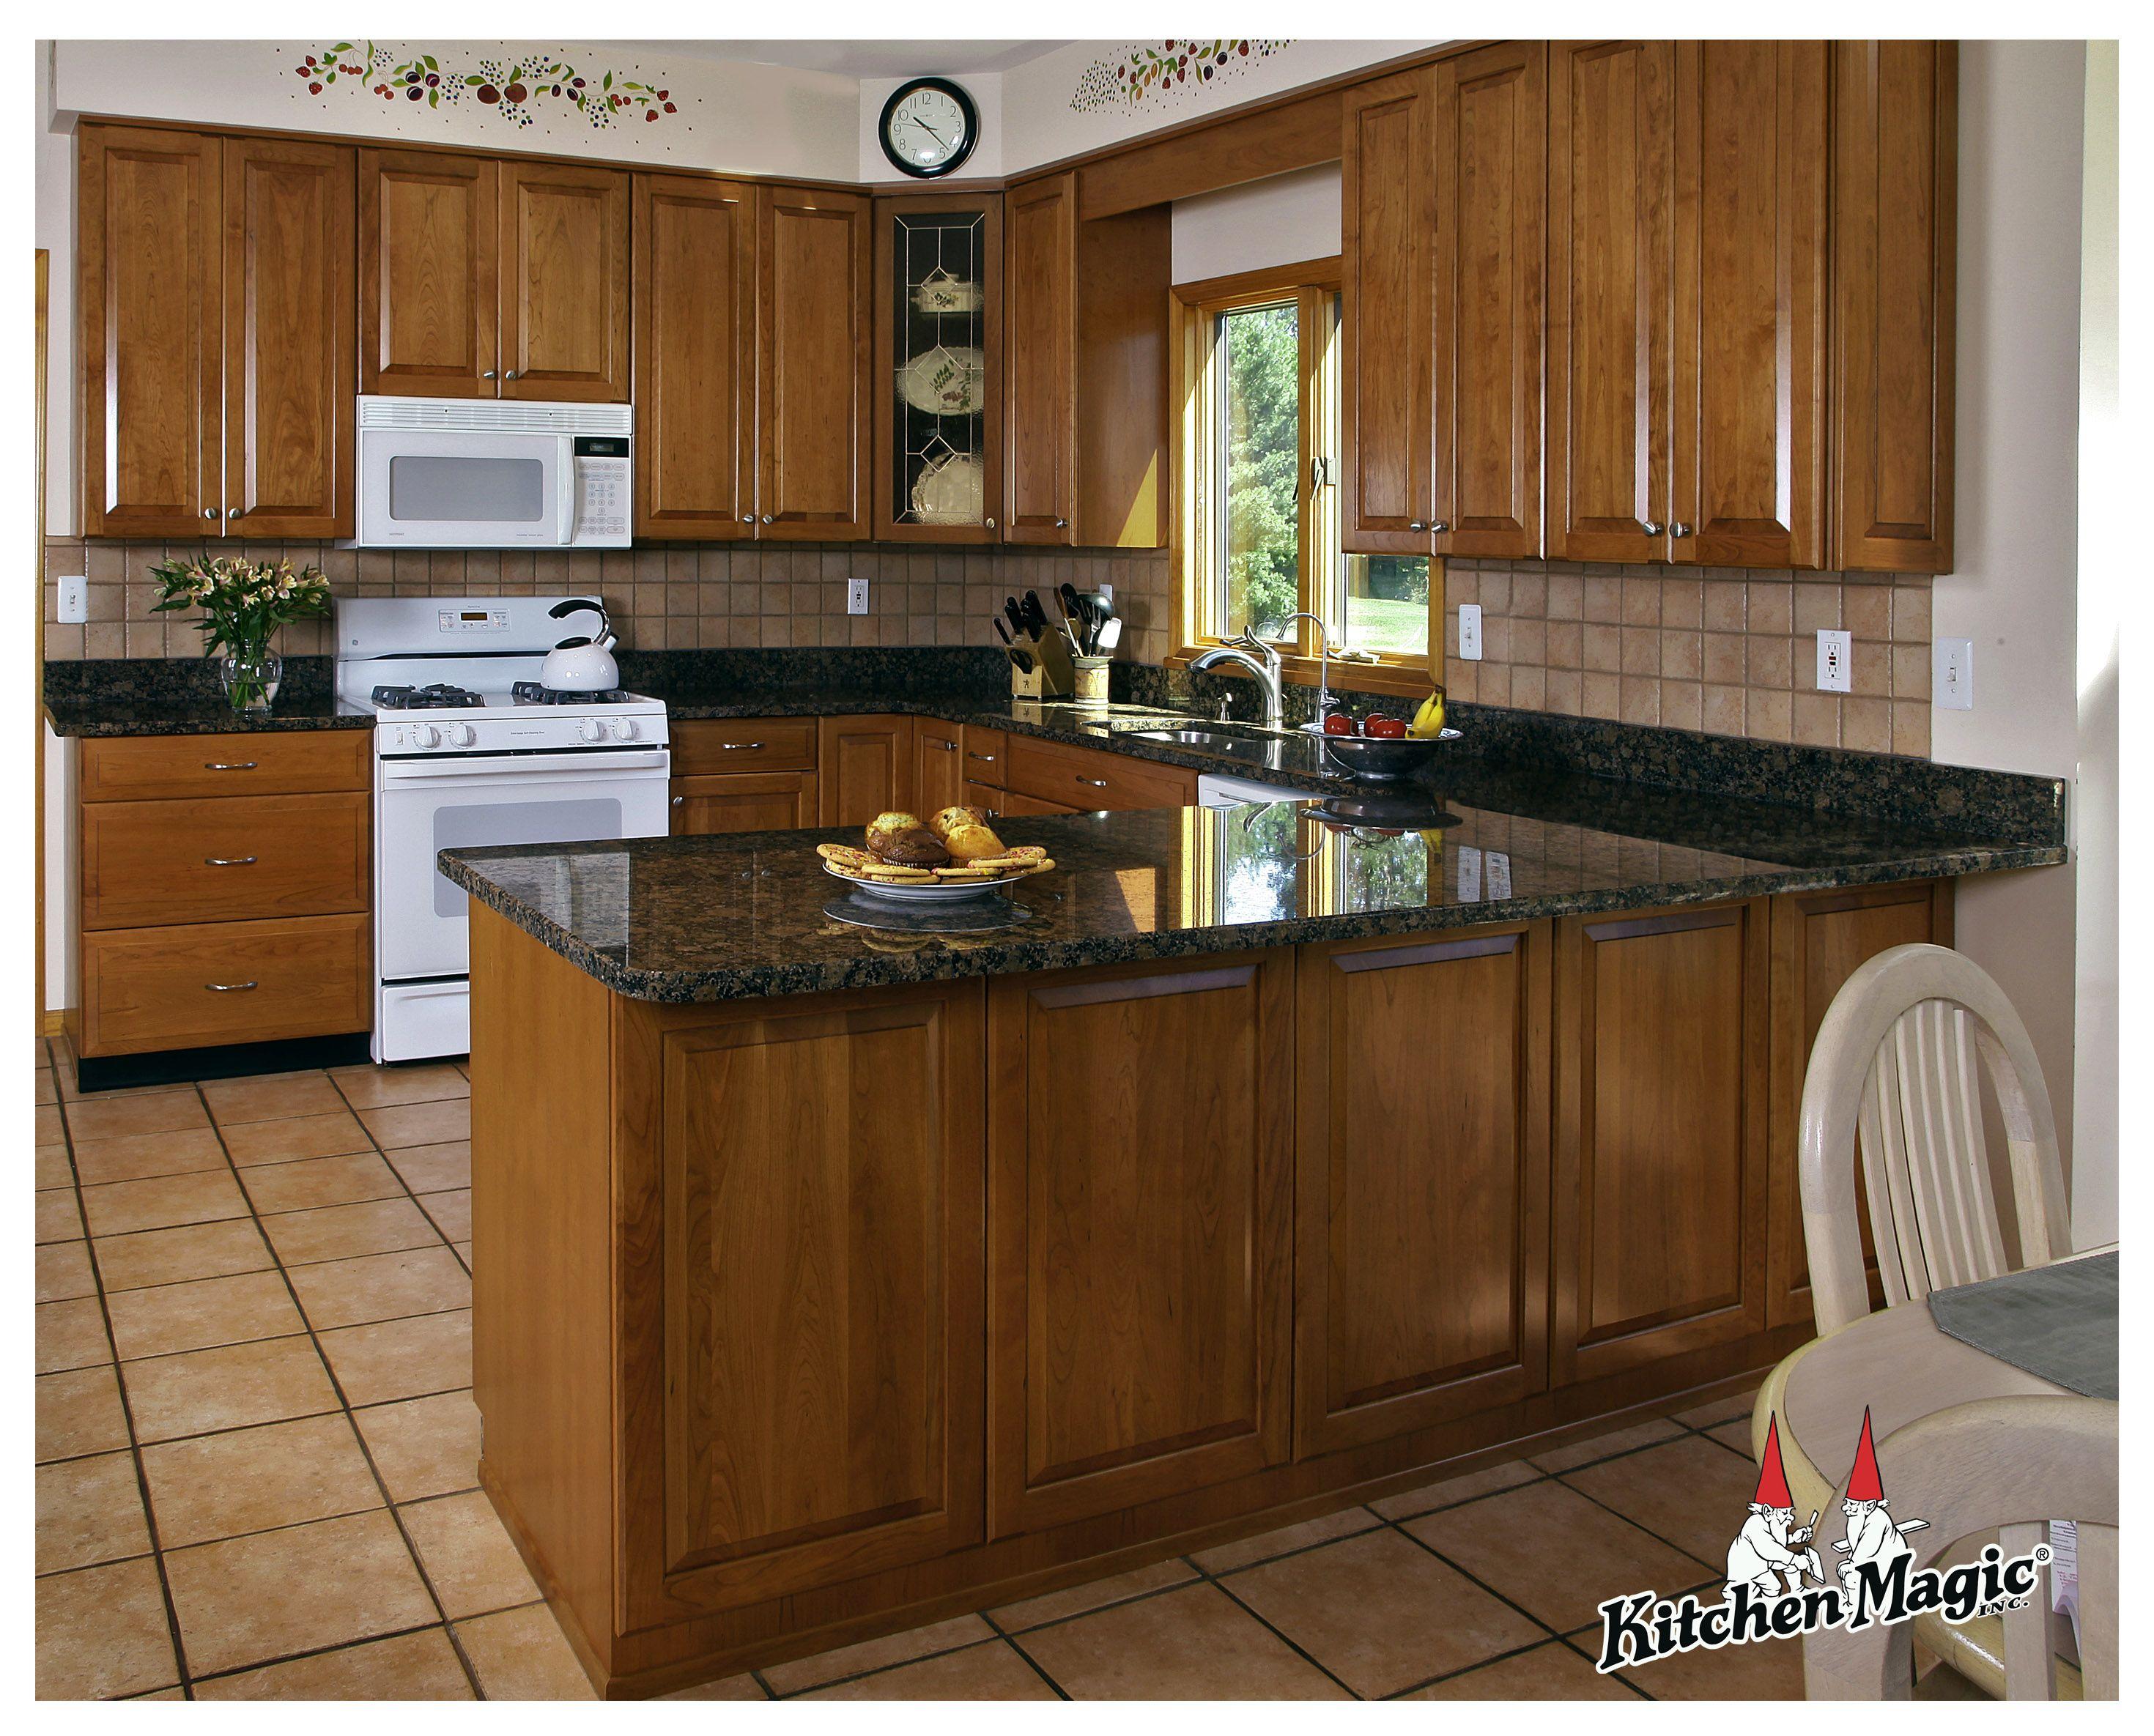 Kitchen Design Blog | Granite countertop, Countertop and Granite